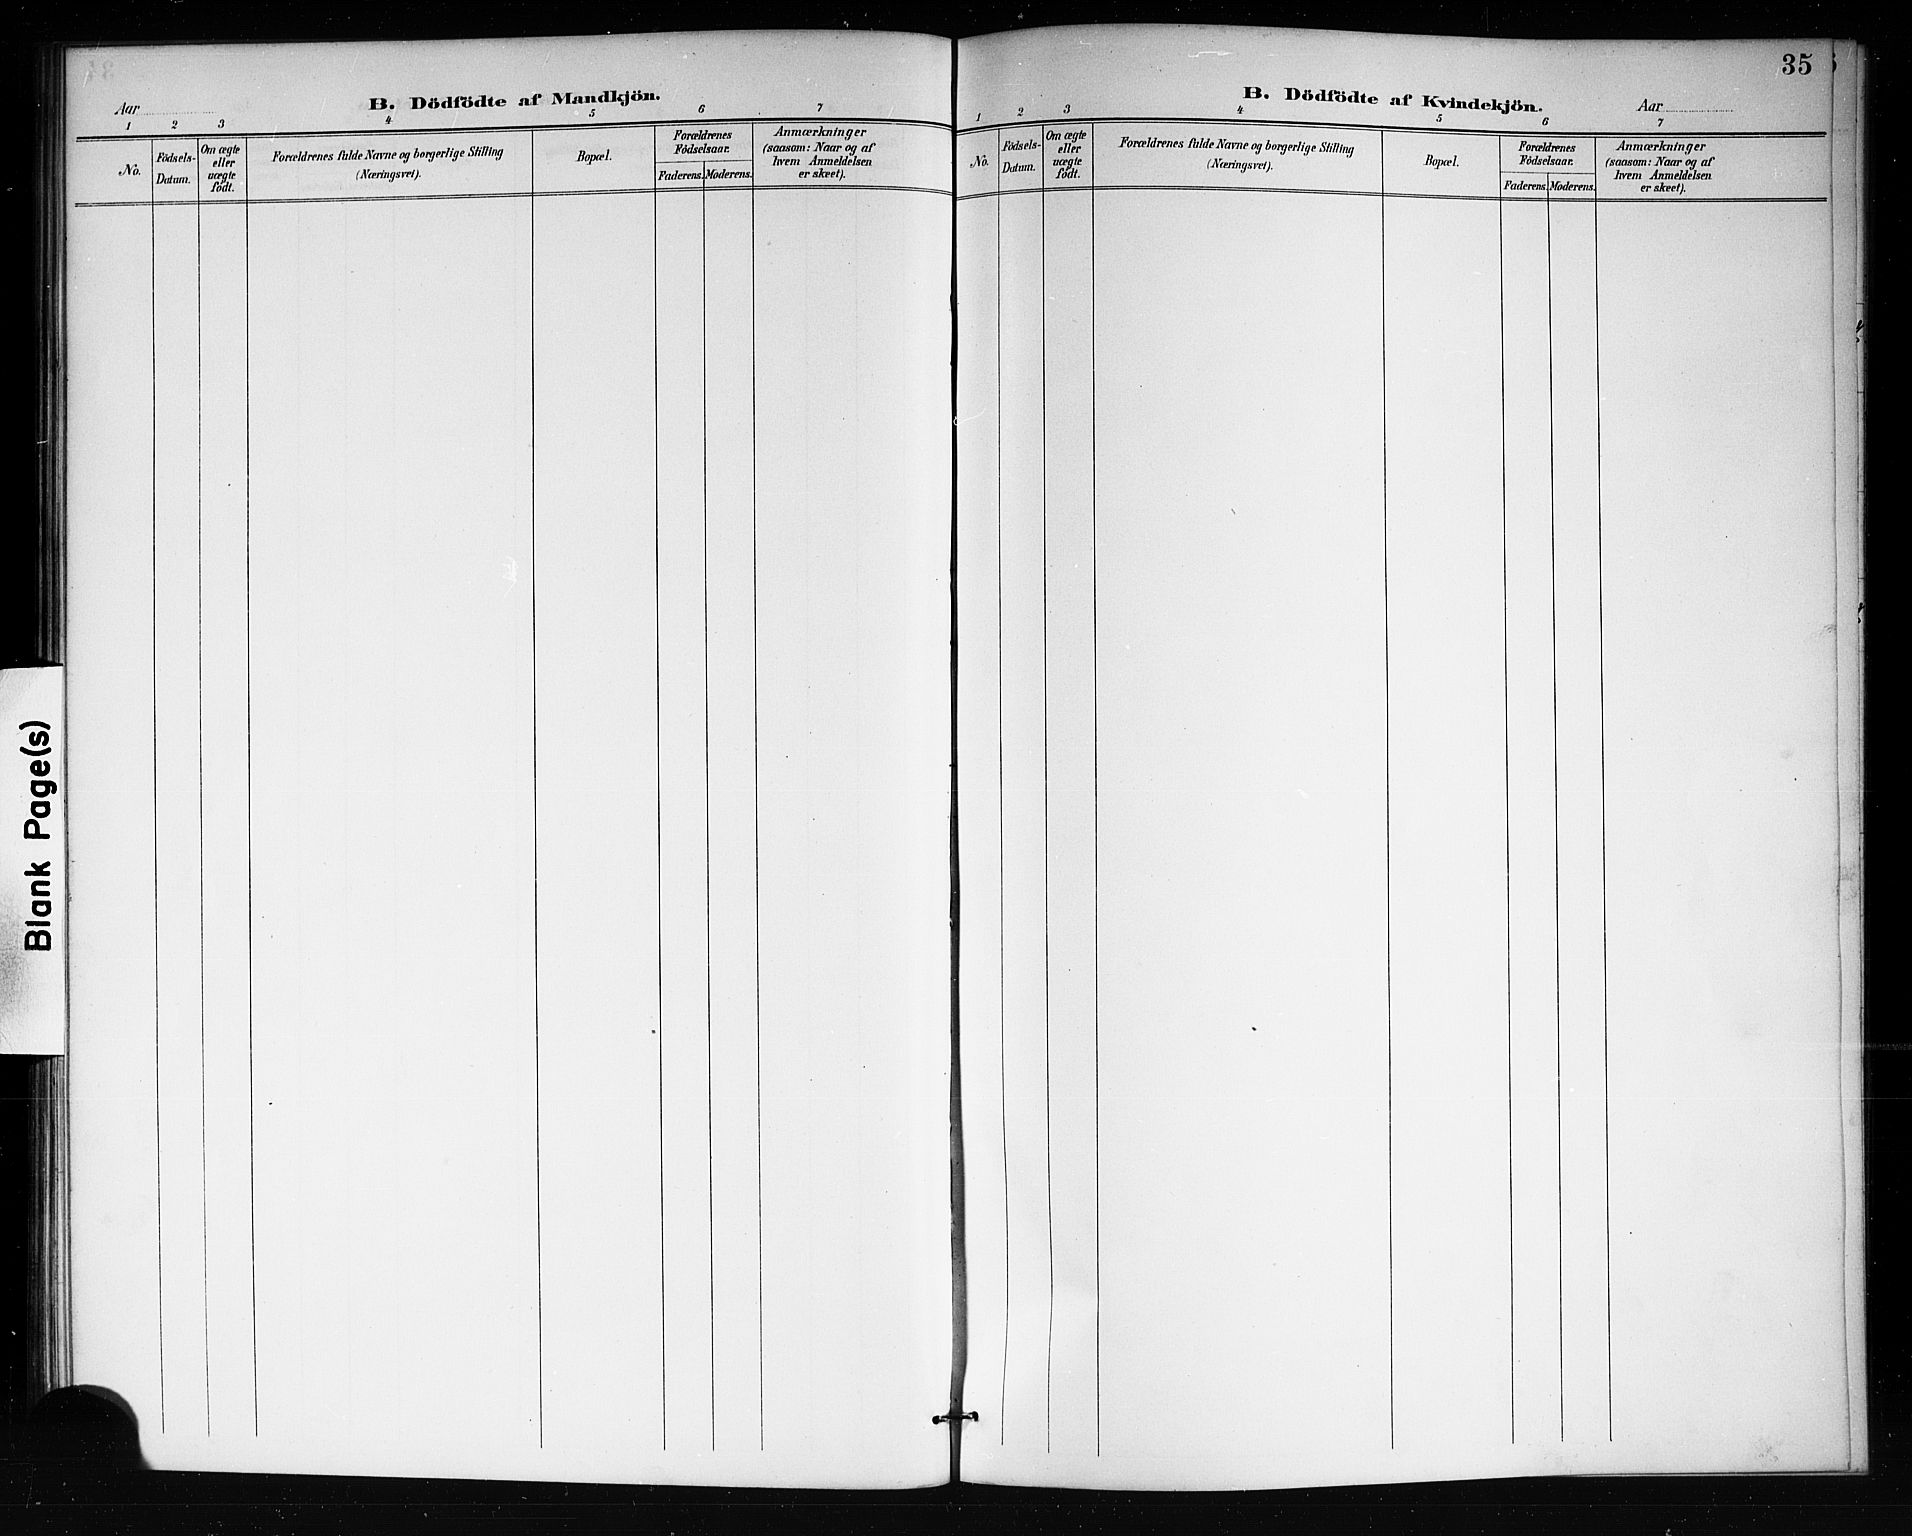 SAKO, Lårdal kirkebøker, G/Gb/L0003: Klokkerbok nr. II 3, 1889-1920, s. 35